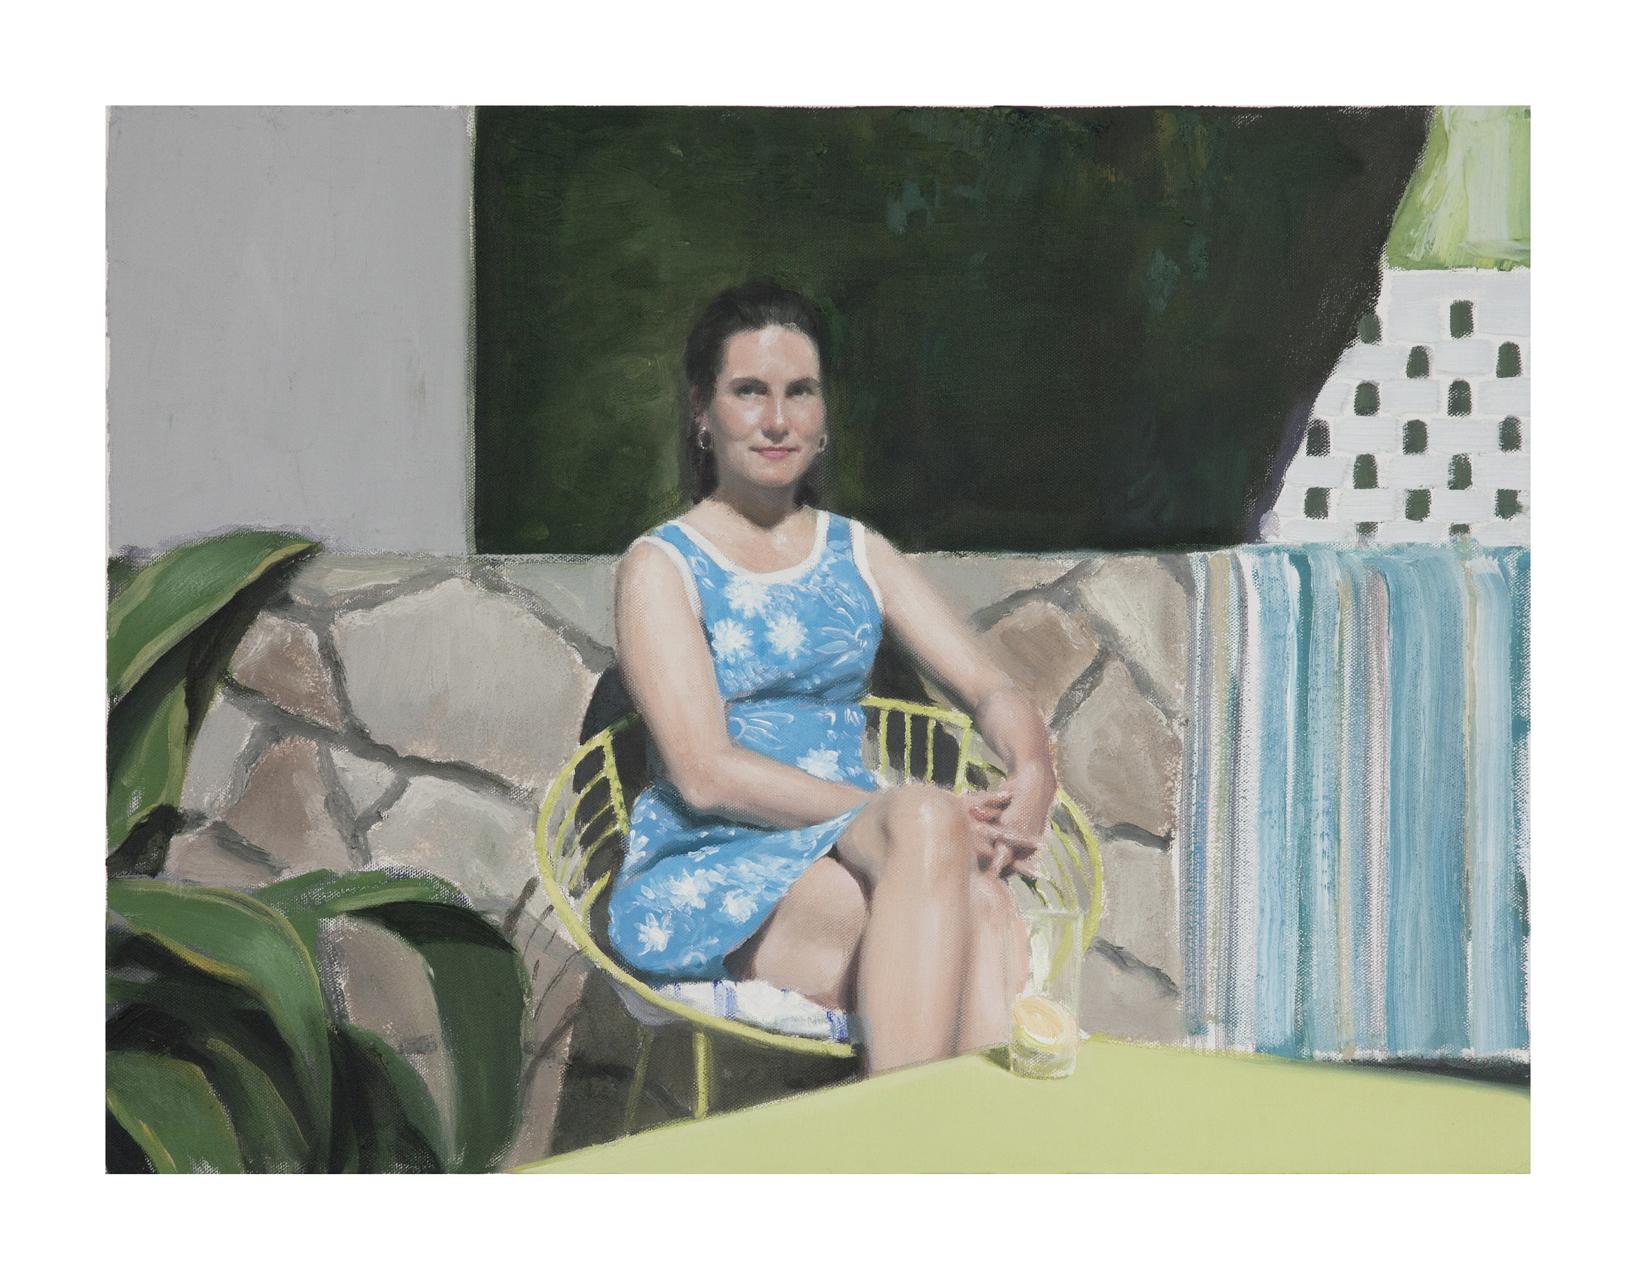 Jonathan Wateridge, Enclave Study No. 6 (Expat), 2015, Öl auf Leinwand, 45 x 60 cm